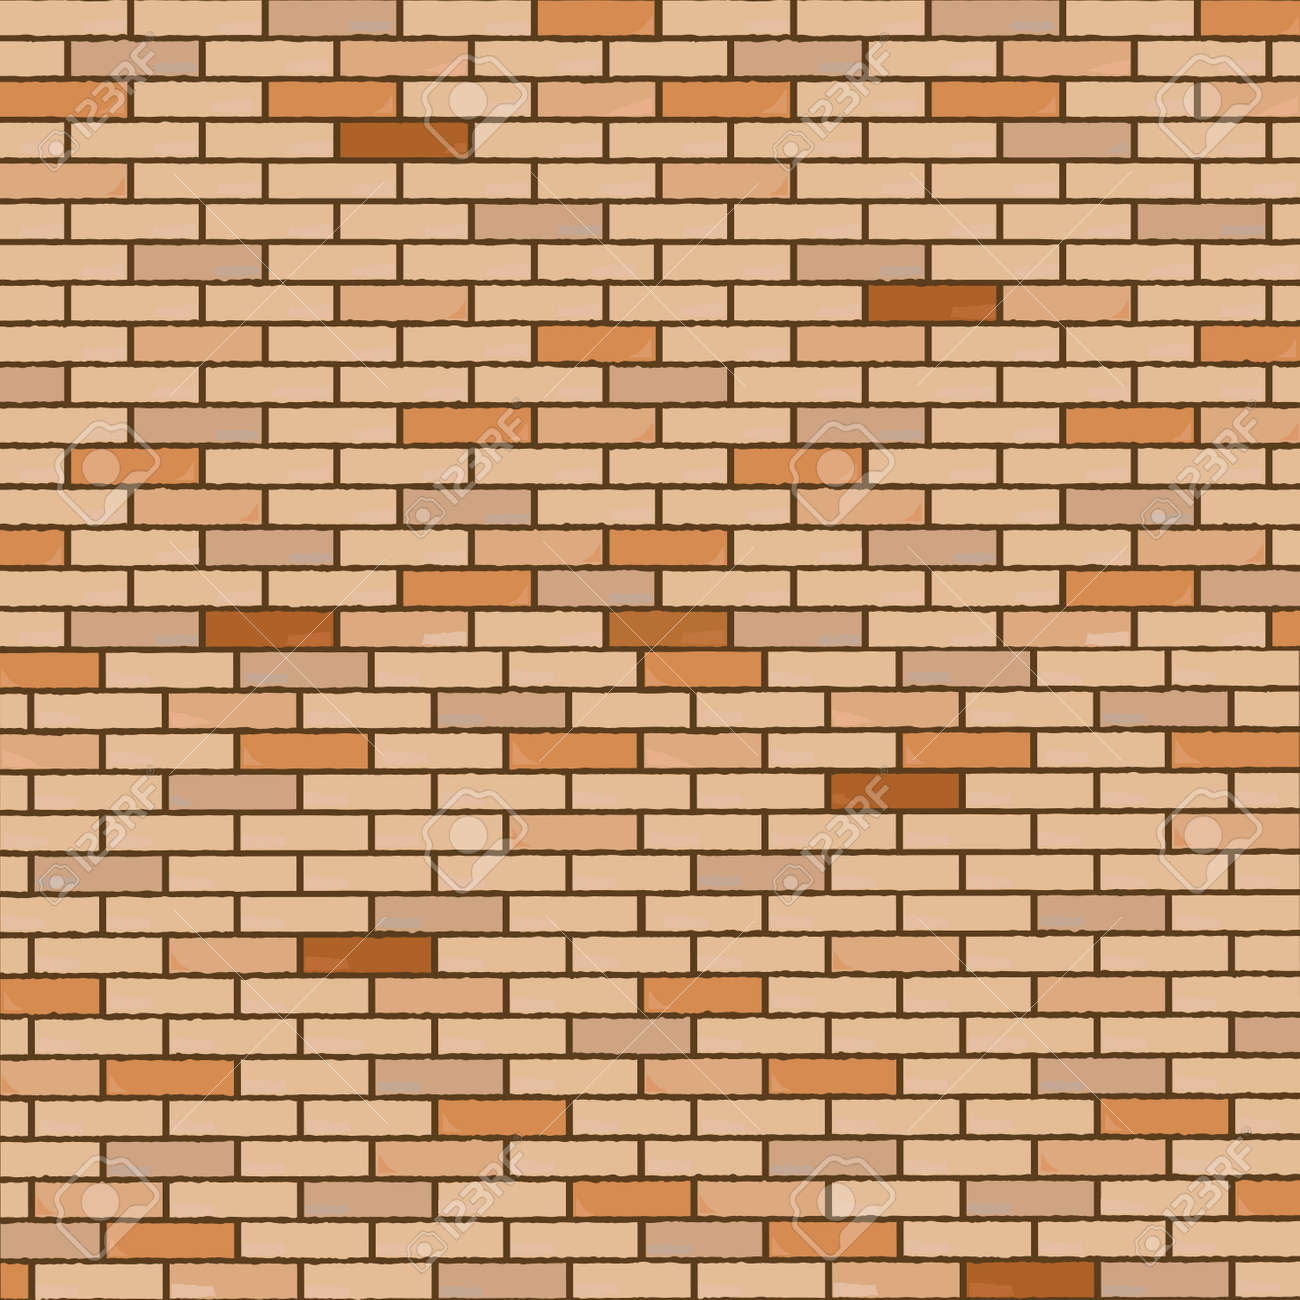 wall made of bricks, realistic texture, abstract art illustration Stock Vector - 6356336